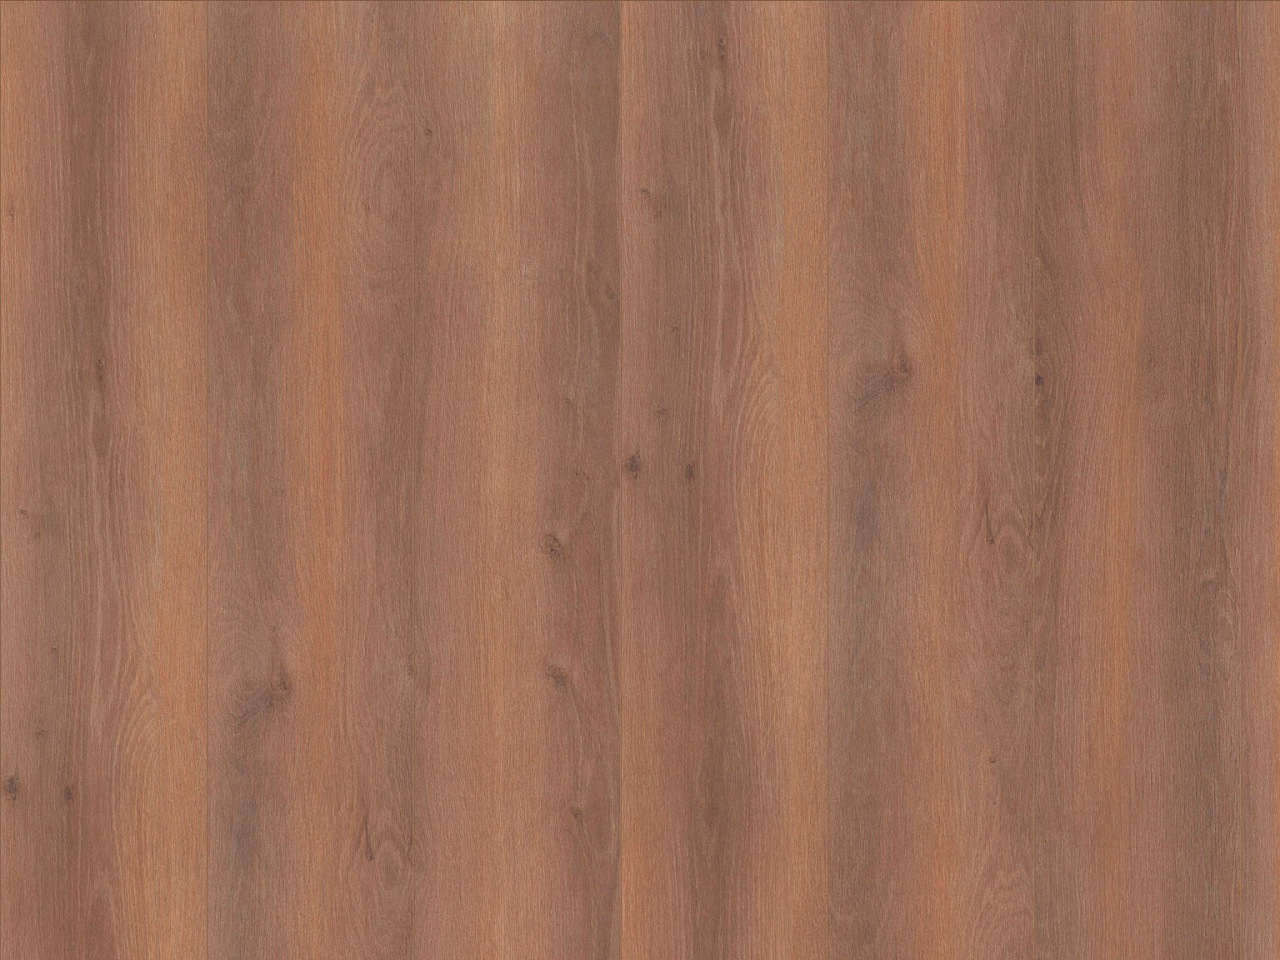 Laminatboden Oak Gallery Format L – Calm Oak darkbrown, LV4167